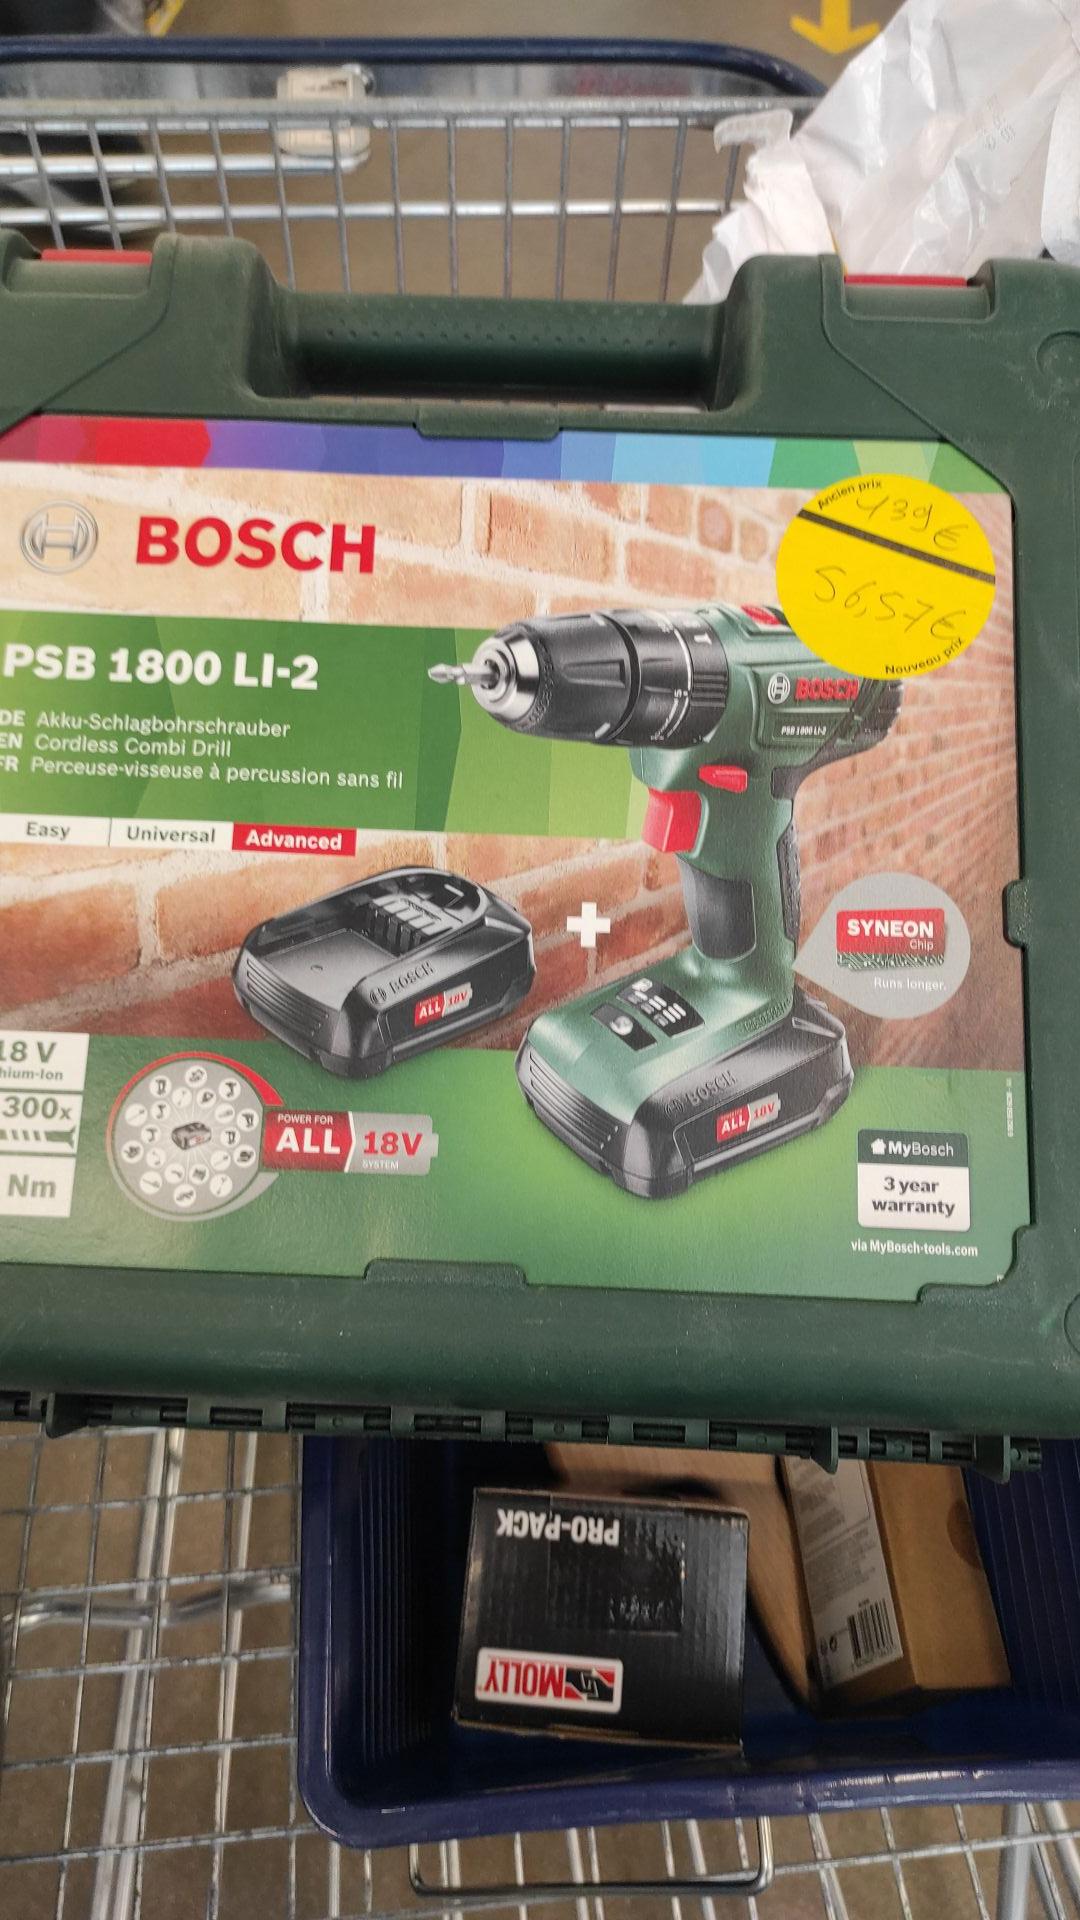 Perceuse à percussion sans fil Bosch PSB1800LI-2 18V - Dardilly (69)